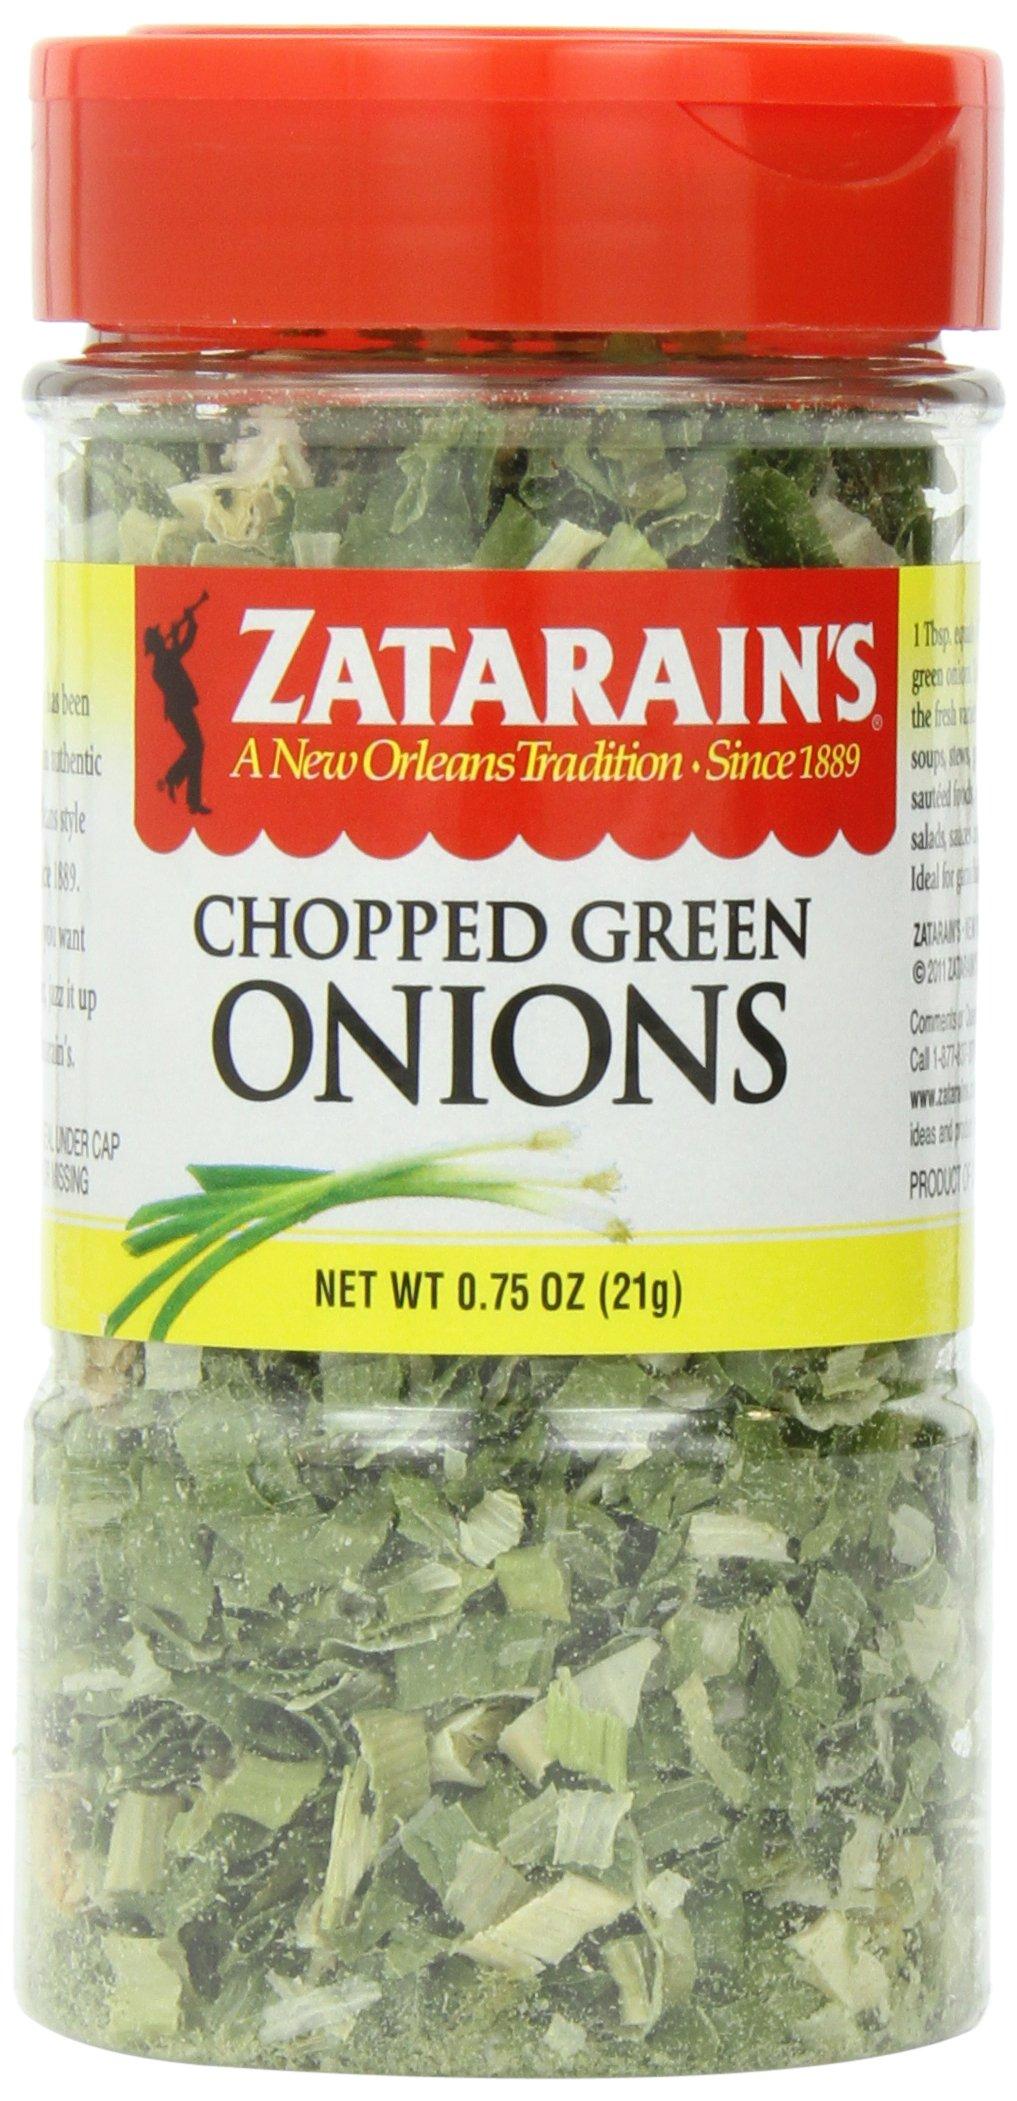 Zatarain's Chopped Green Onions, 0.75 oz (Pack of 6)